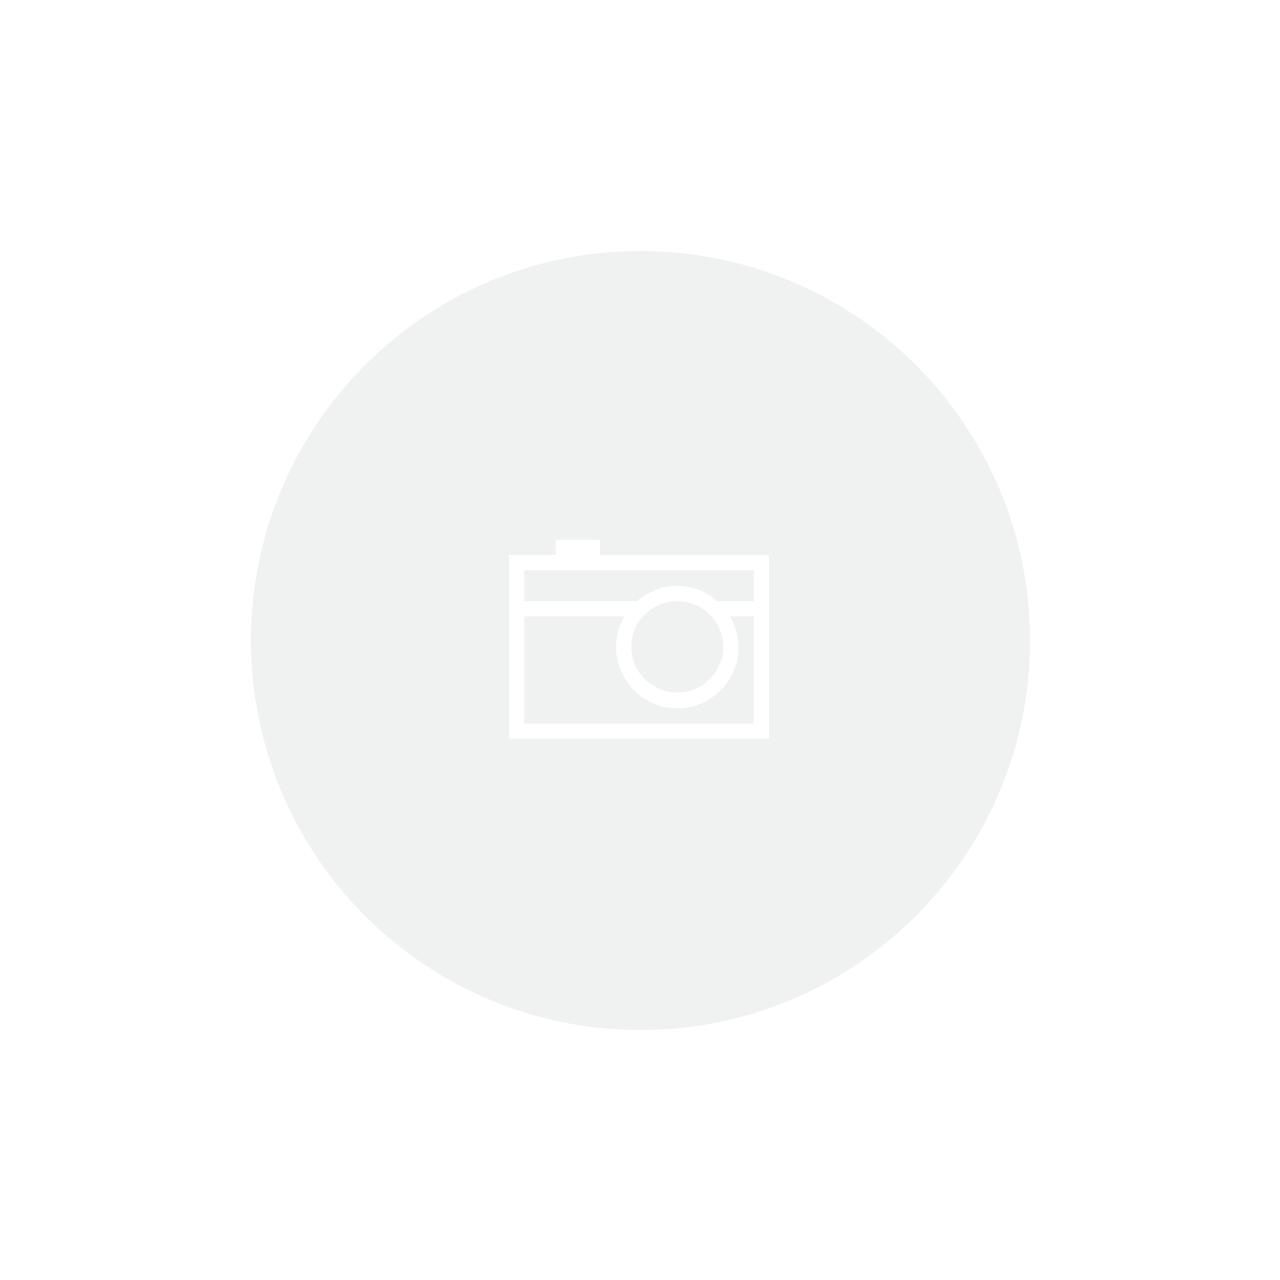 BICICLETA SPEED SOUL HAWI TT CARBON 22V DURA ACE (CUSTOM)